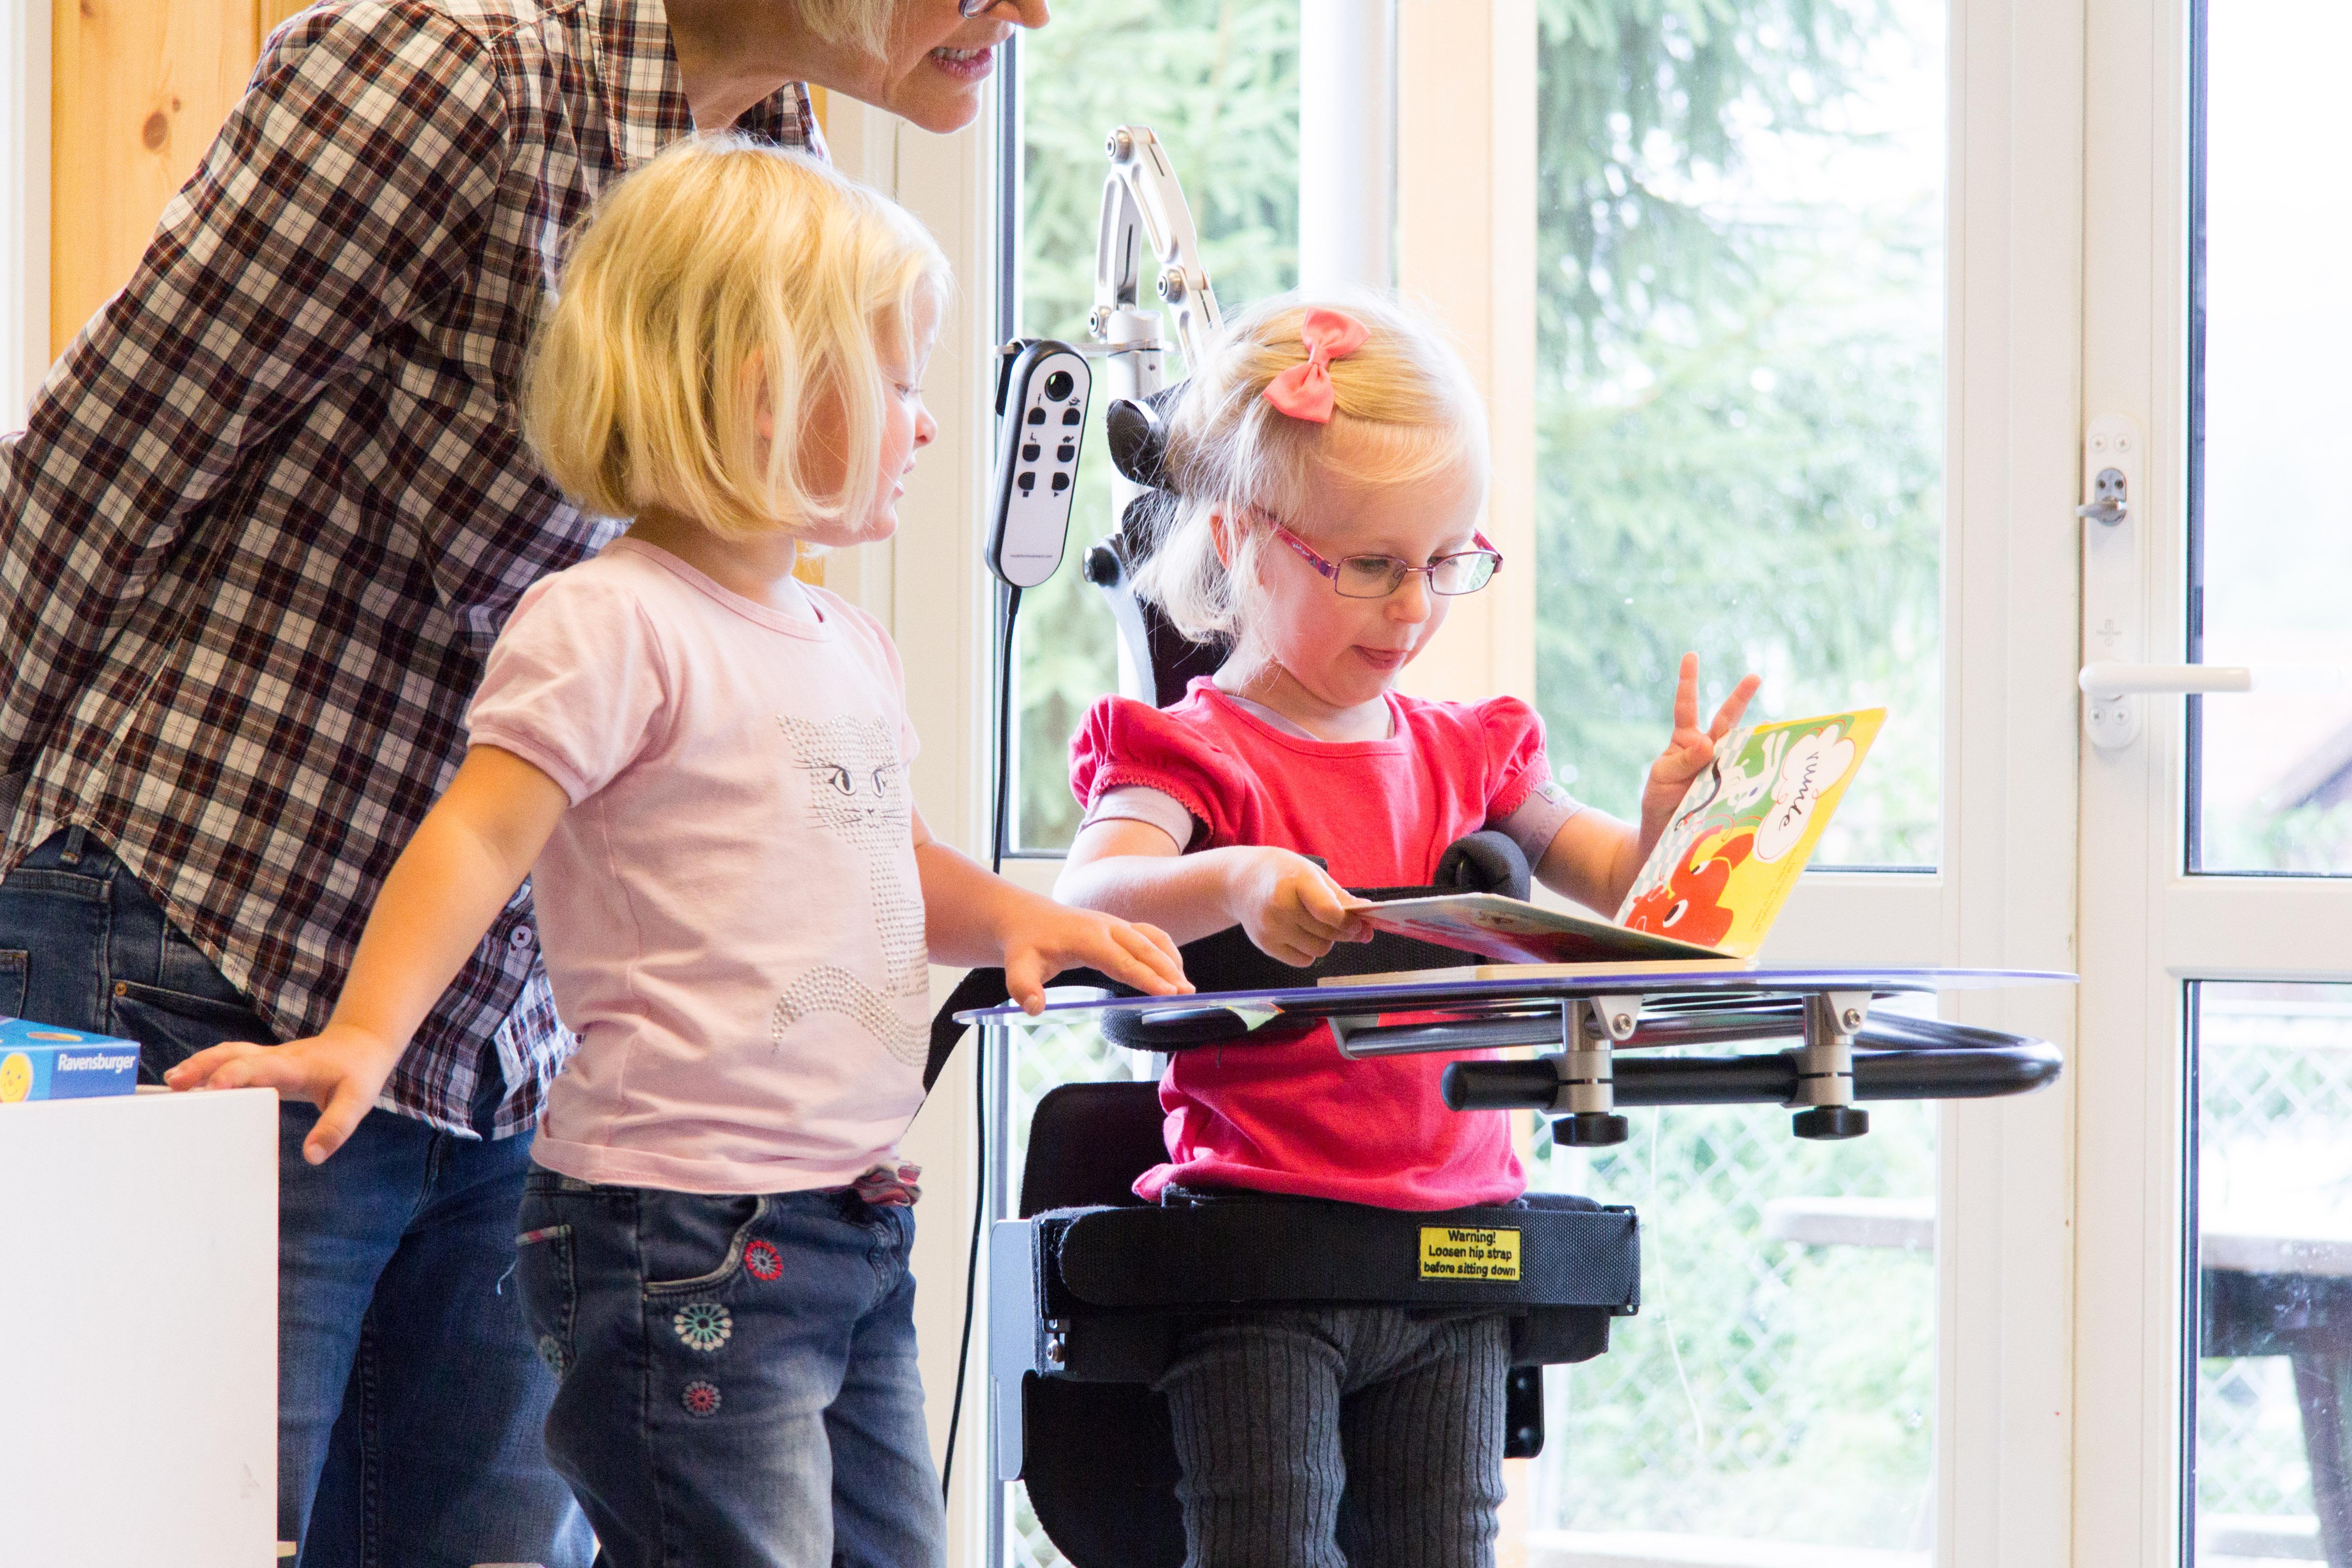 Pediatric Evaluation of Disability Inventory Computer Adaptive Test (PEDI-CAT)